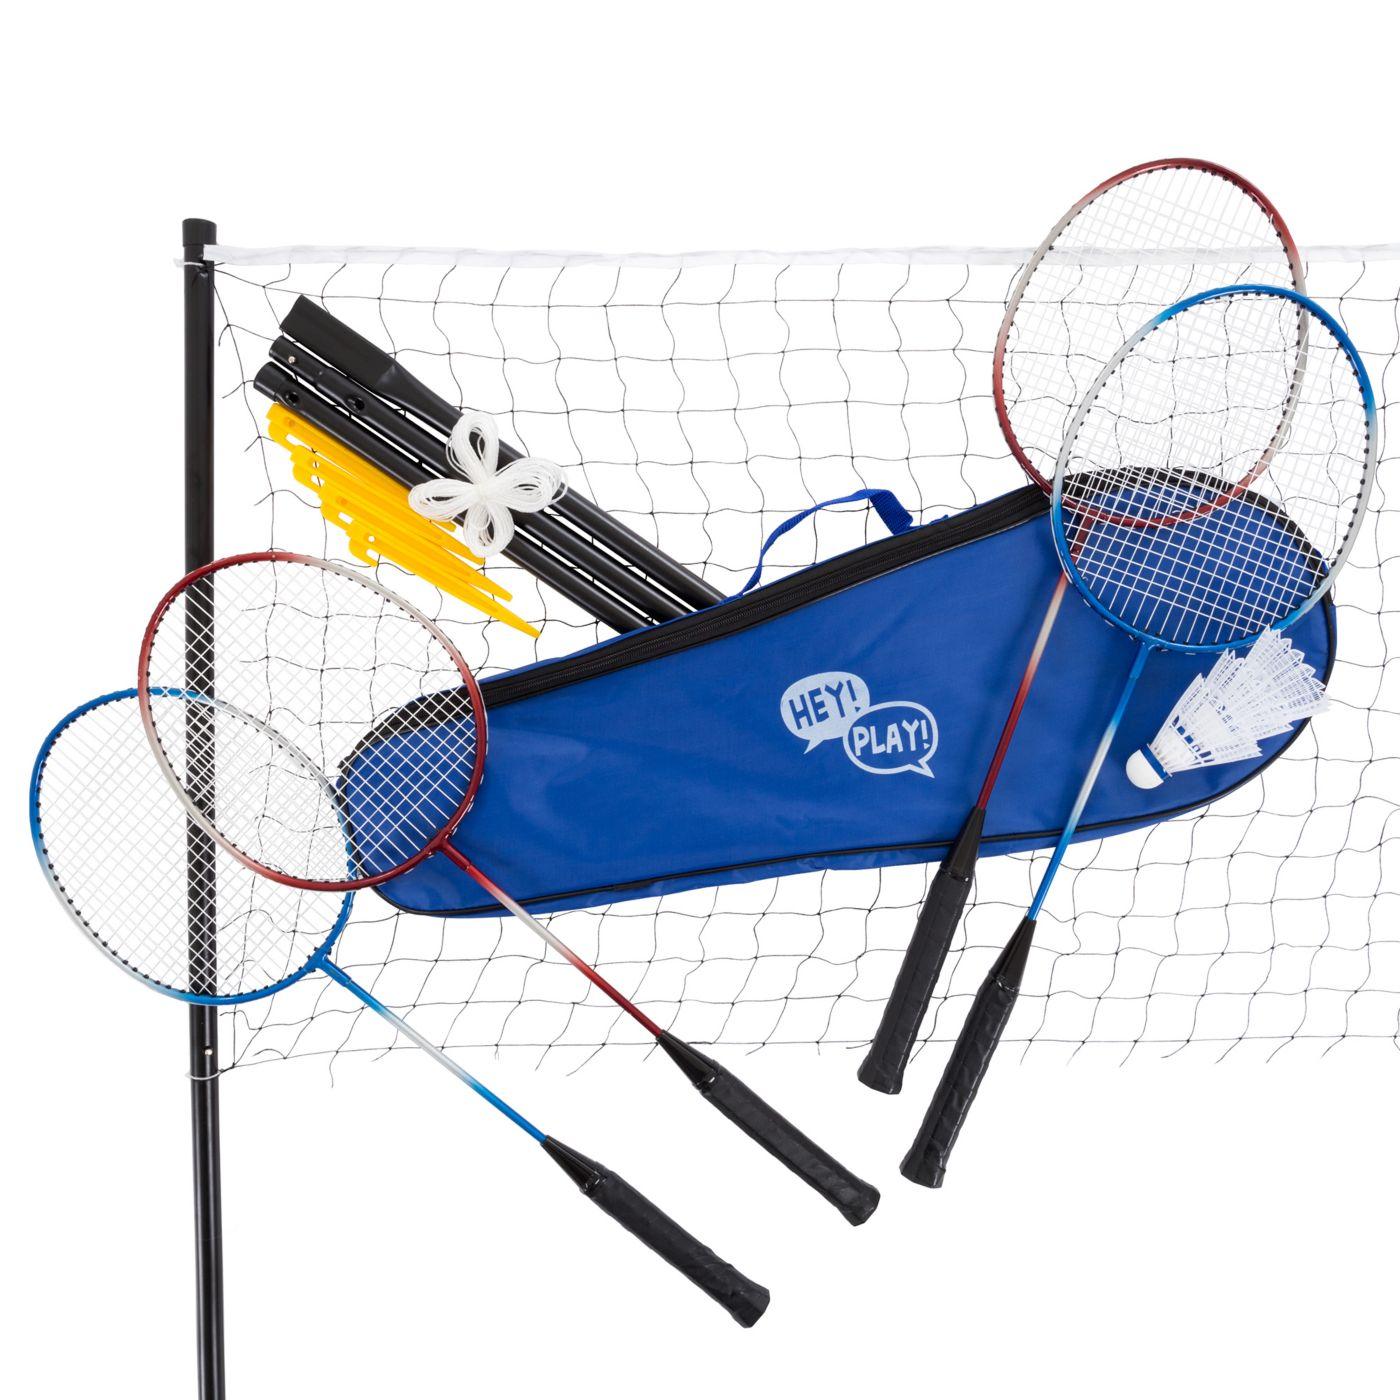 Hey! Play! Badminton Set